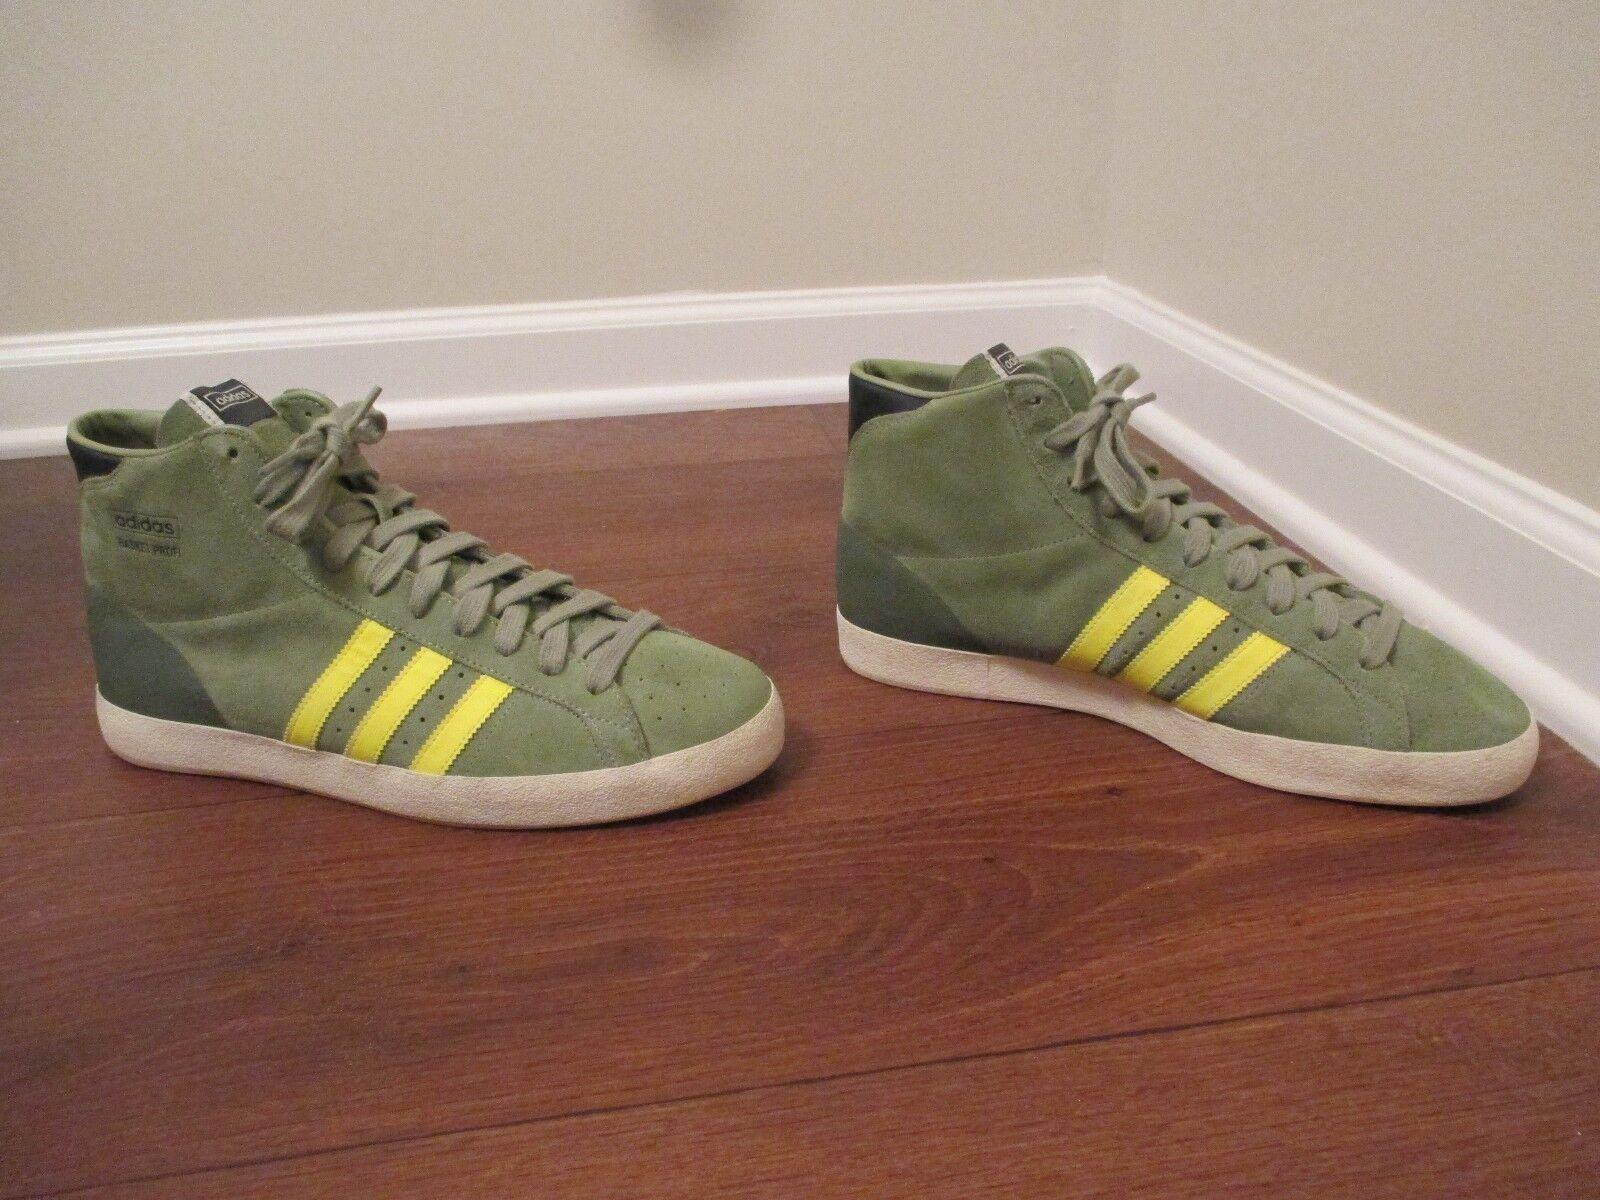 Era indossato taglia 12 adidas adidas adidas cesto cape scarpe tenda verde giallo & electric e5bbb9